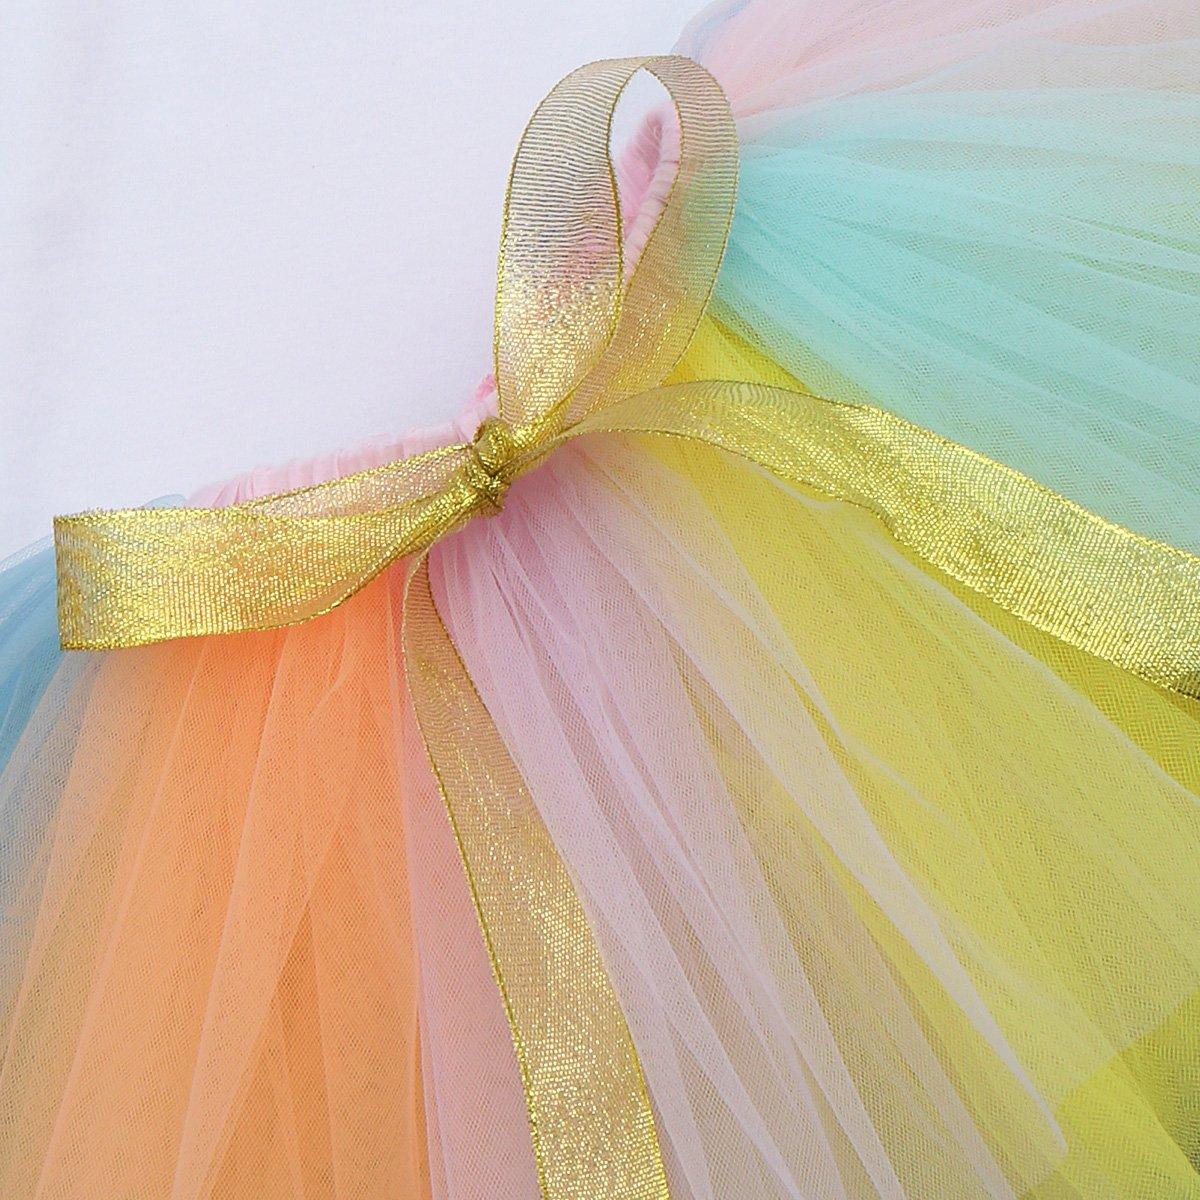 Unicorn Outfits Baby Girl Romper Ruffle Tutu Skirt Headband First Birthday Party Clothes 3PCS Set